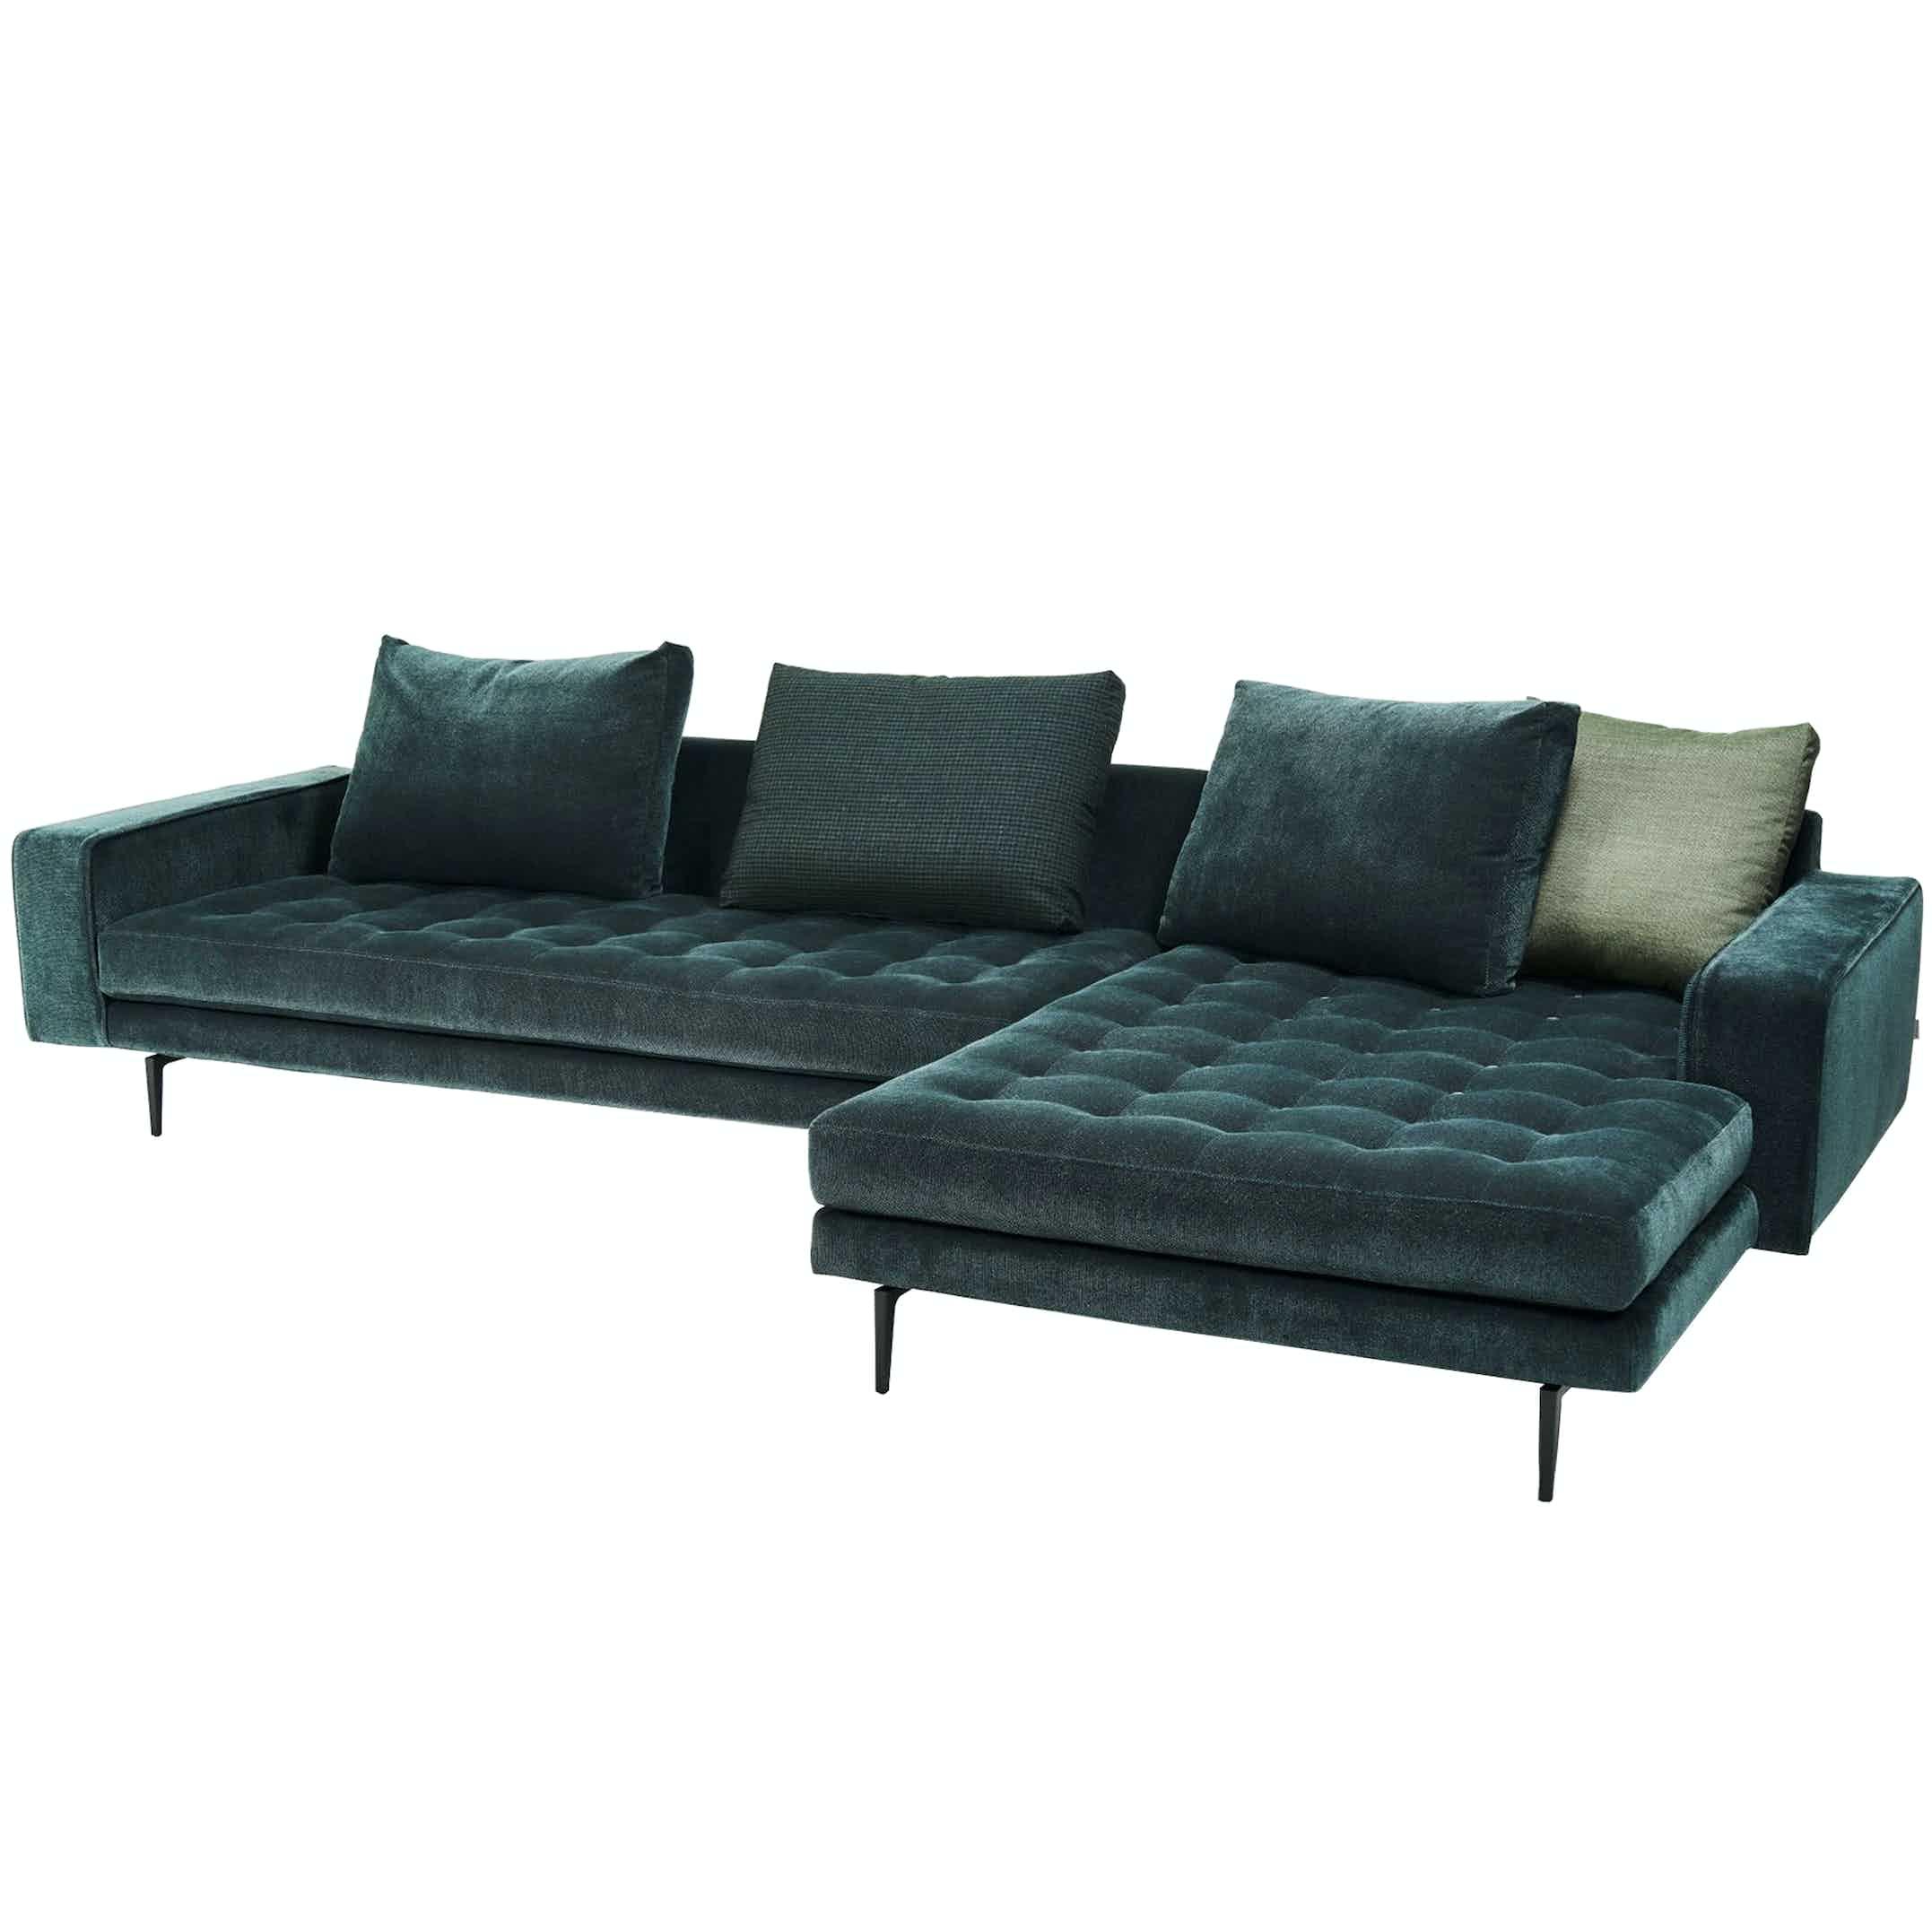 Wendelbo-campo-sofa-thumbnail-haute-living